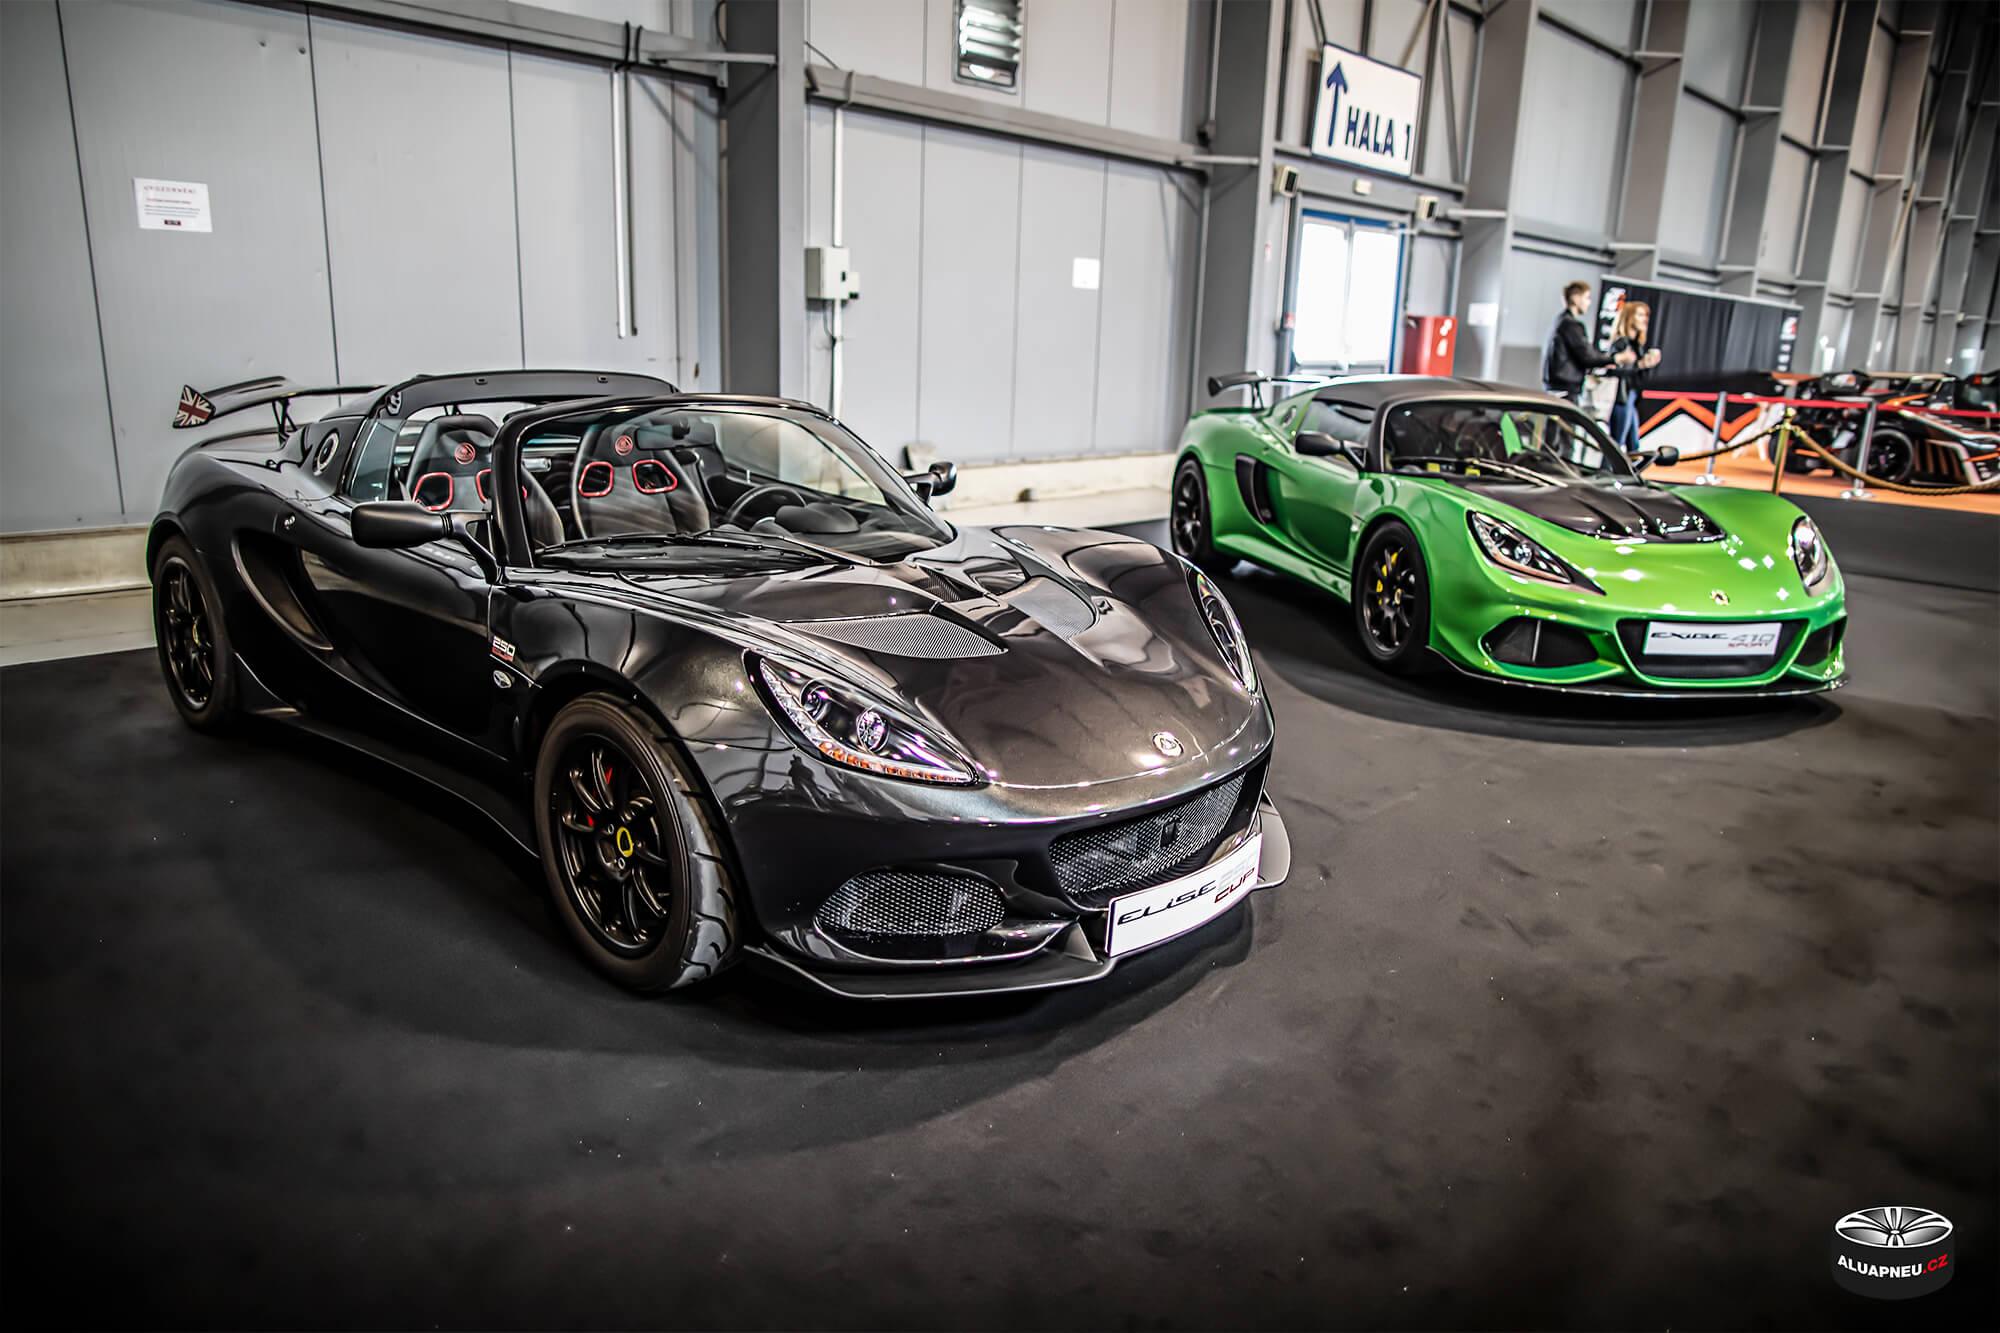 Lotus Elise - Autosalon Praha 2019 - www.aluapneu.cz